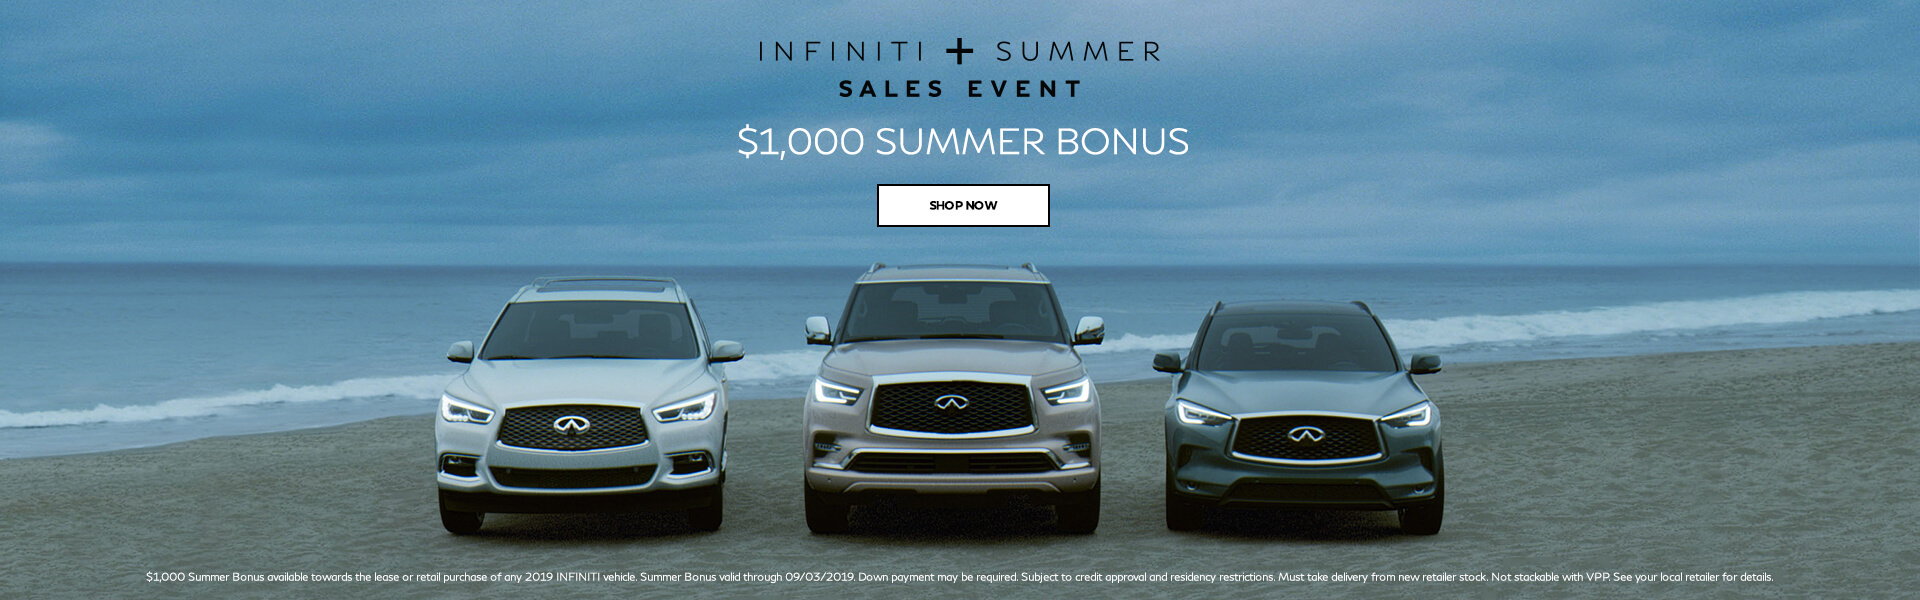 Infiniti Of South Bay New Used Infiniti Dealer Serving Long